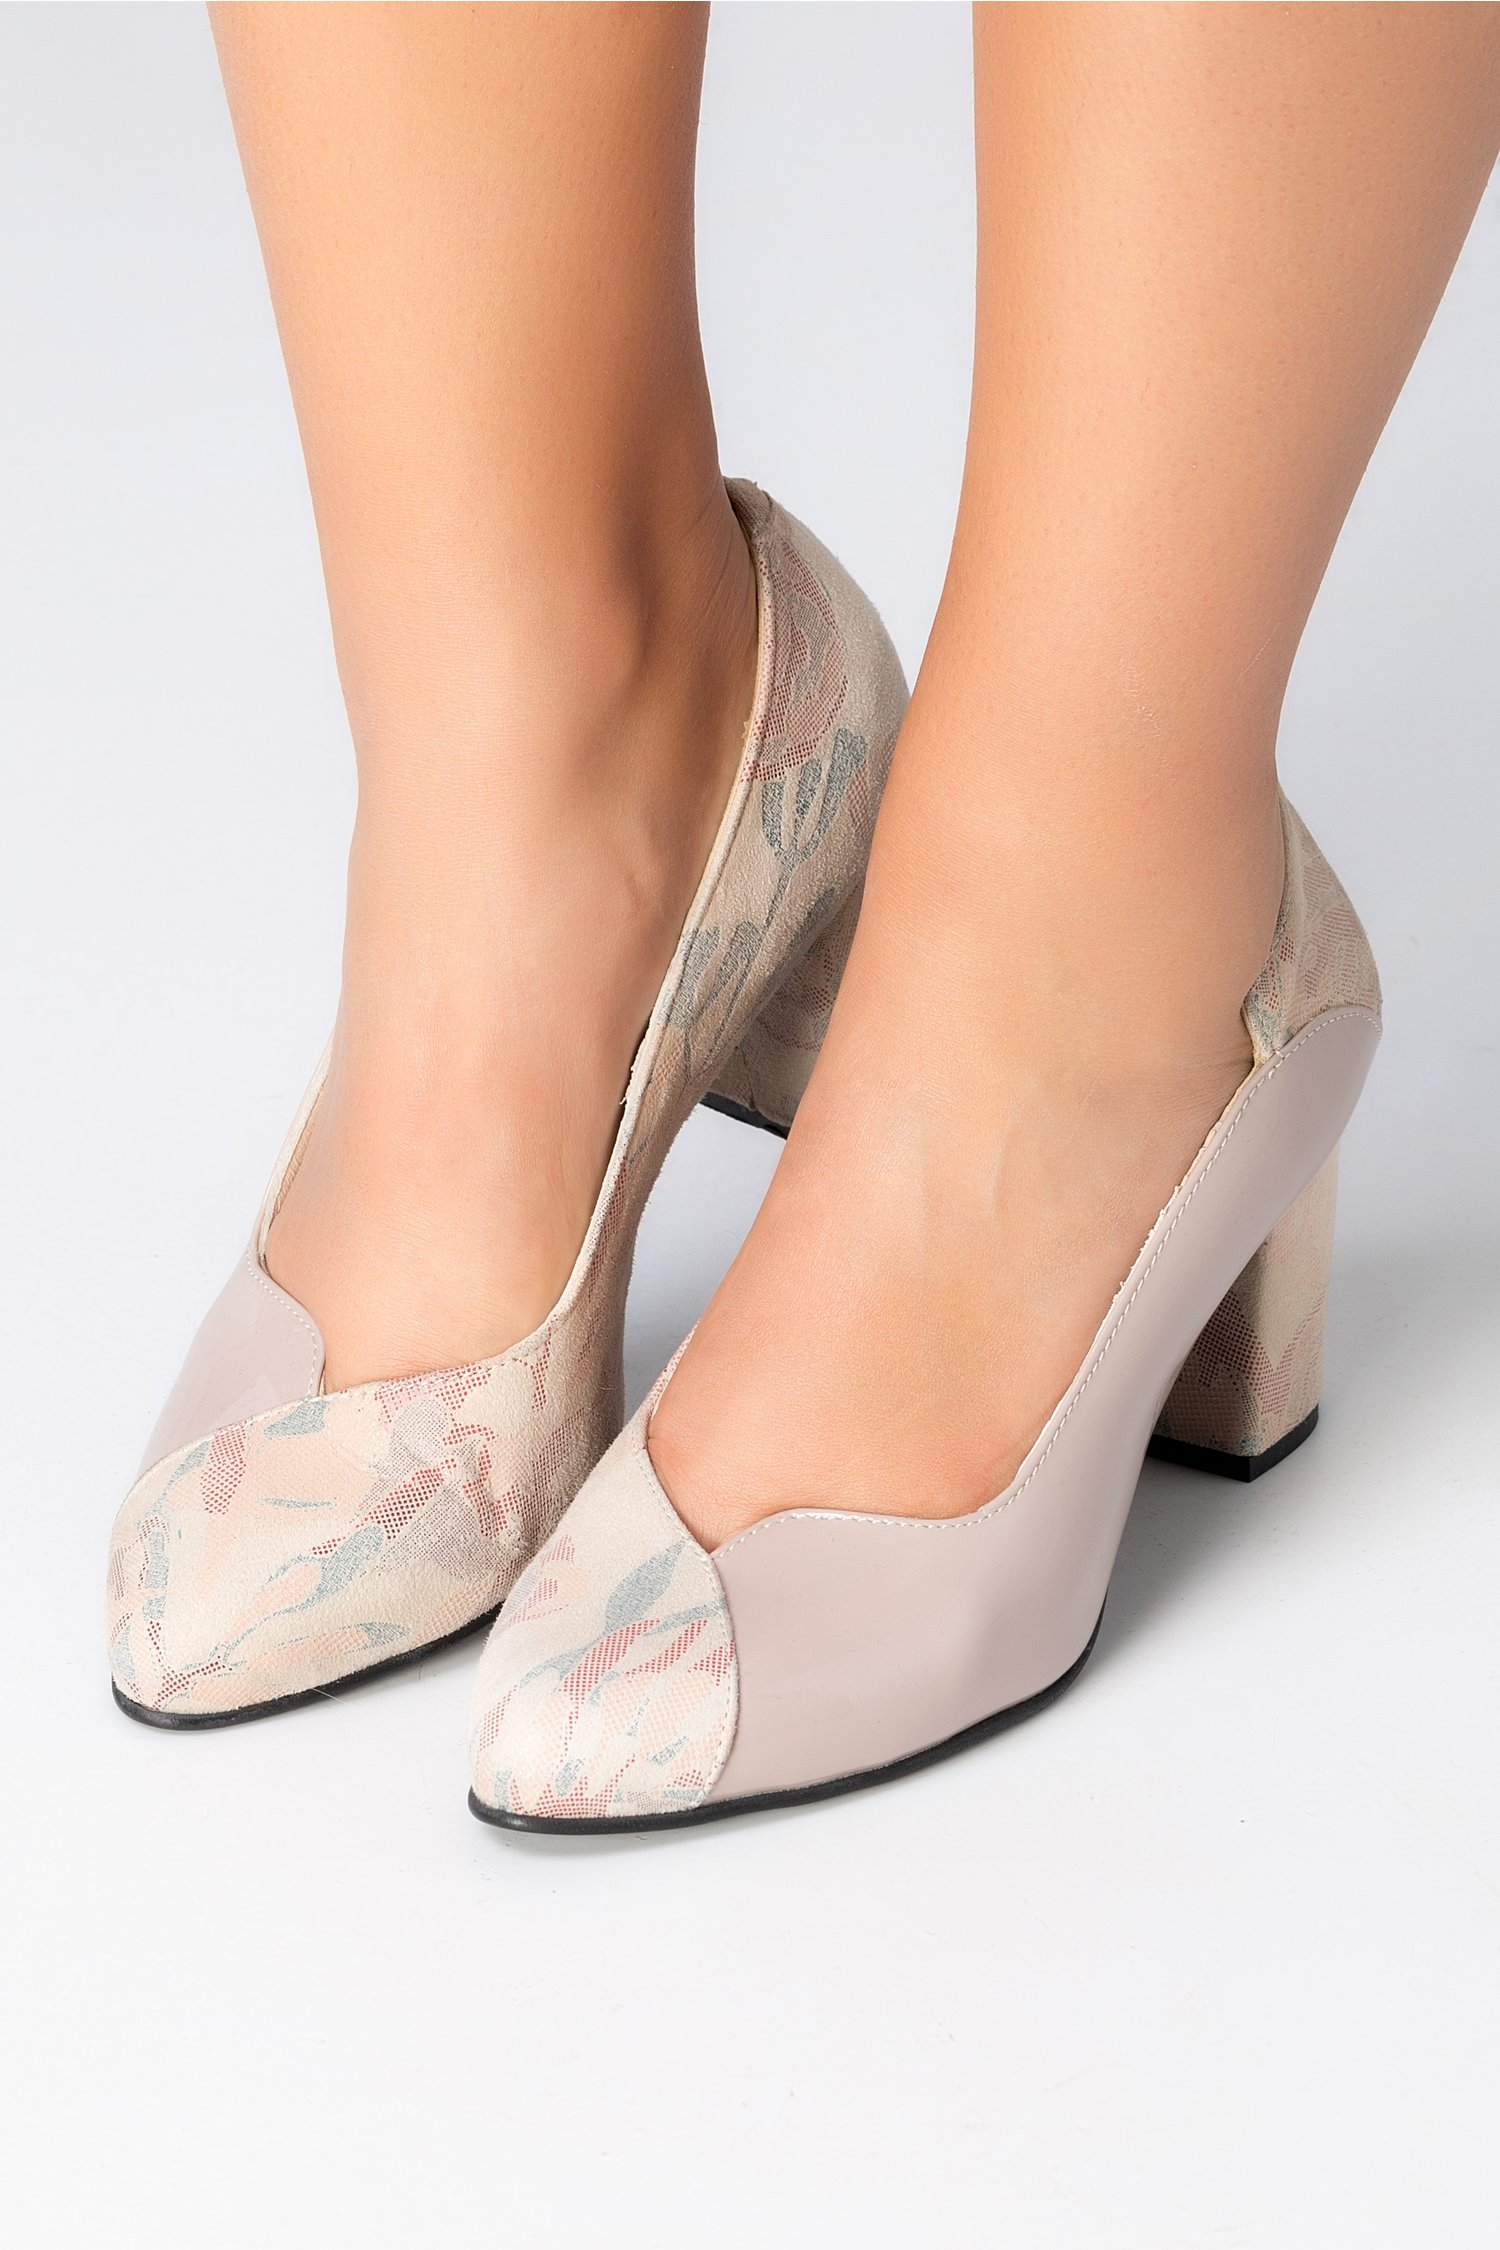 Pantofi Greenary bej cu imprimeuri